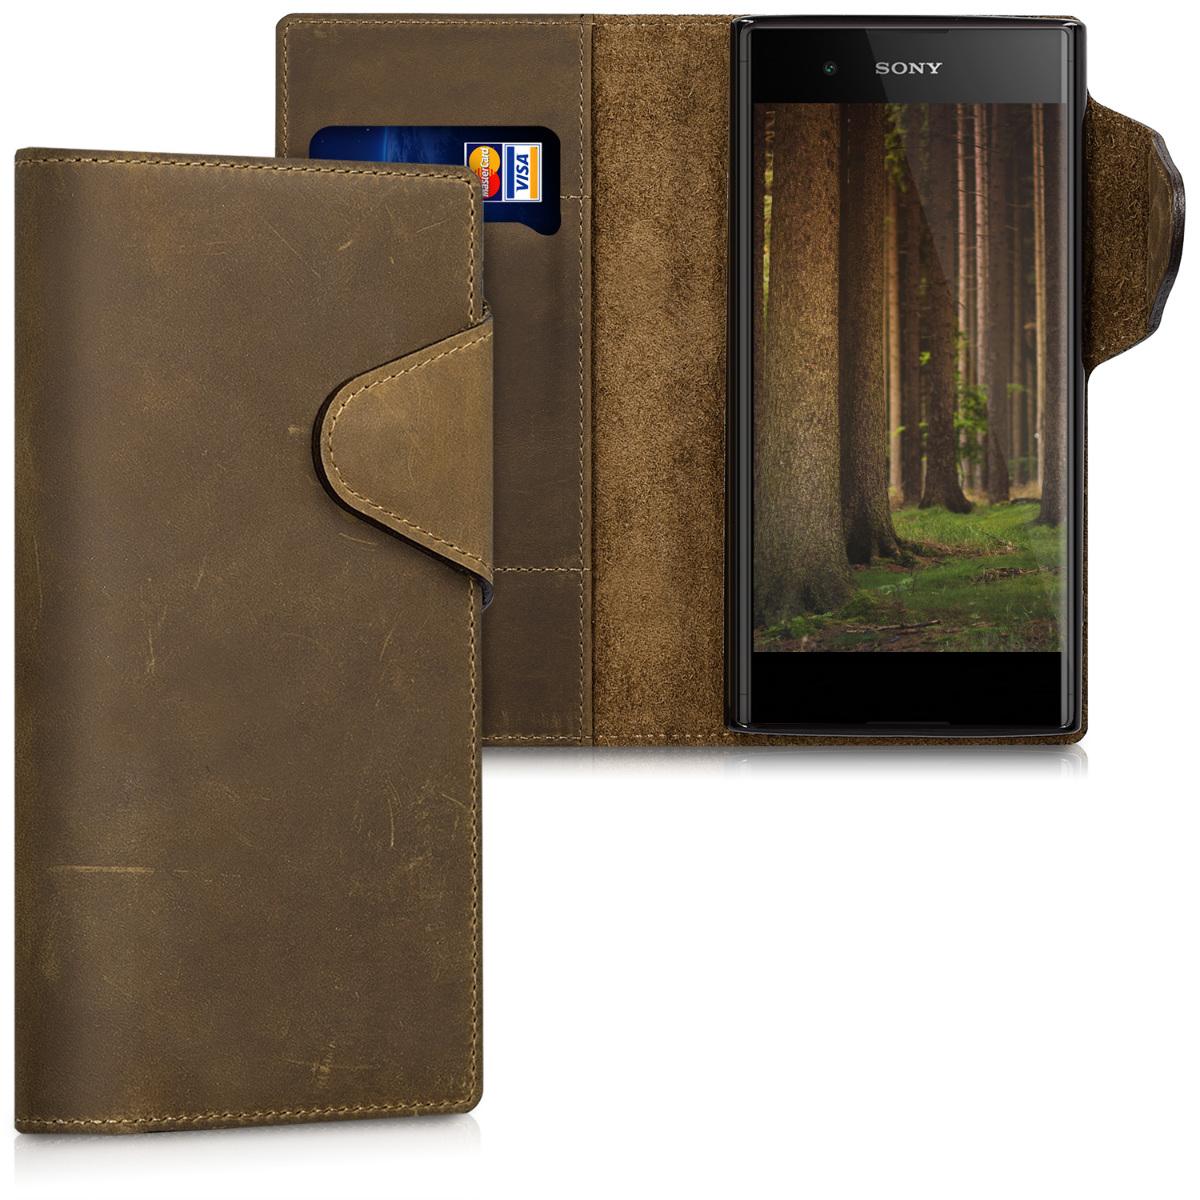 Kalibri Δερμάτινη Suede Θήκη - Πορτοφόλι Sony Xperia XA1 Plus - Brown (43143.05)